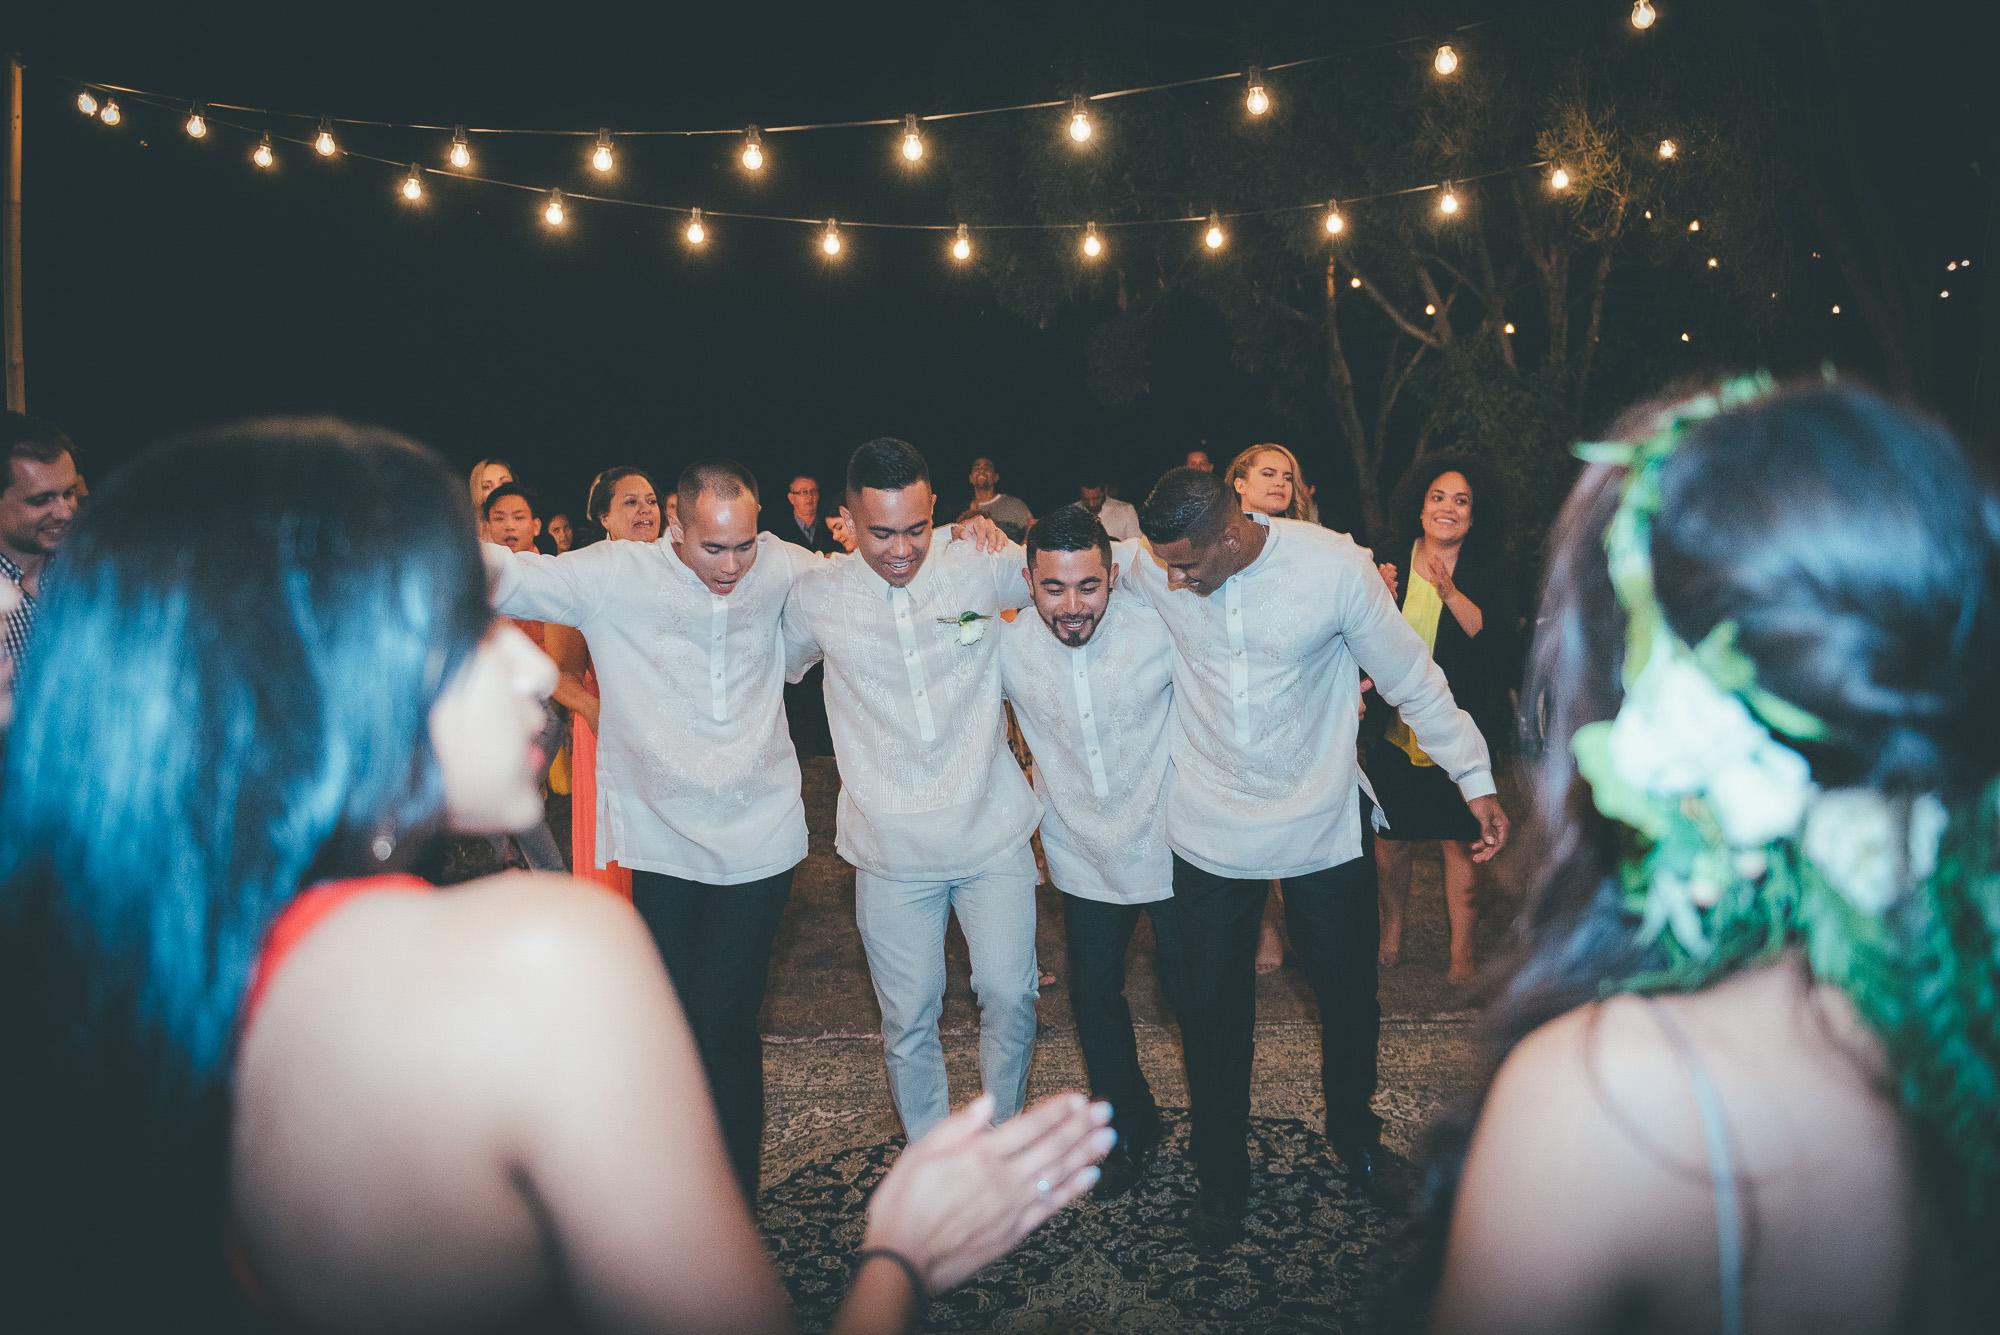 wedding-photographer-outdoor-casual-styled-los-angeles-australia-california-international-earthbound -102.jpg